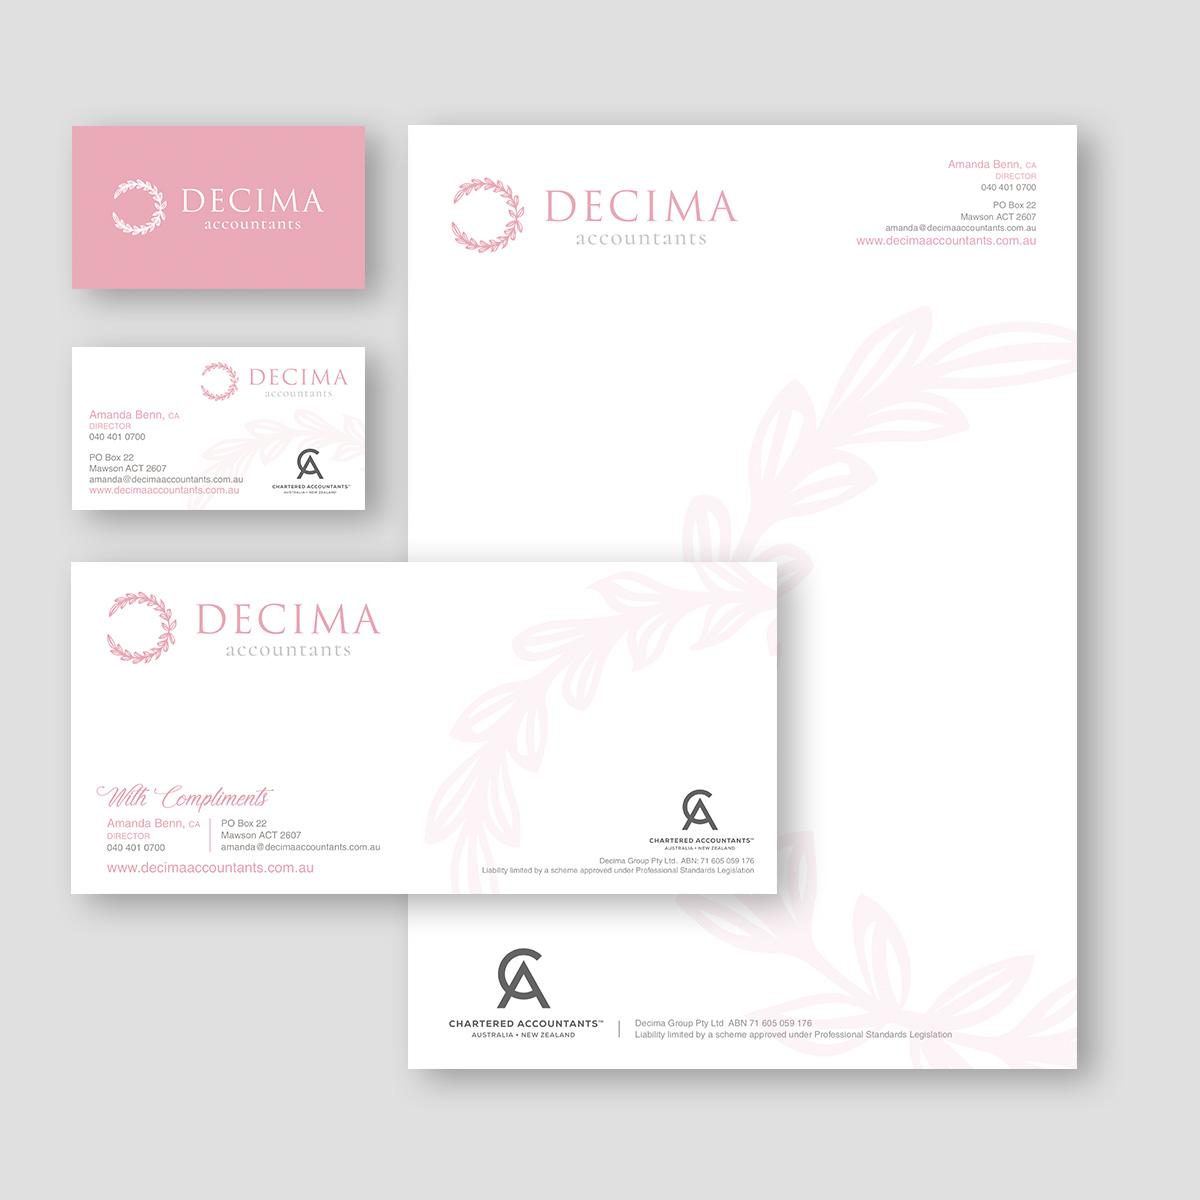 Decima Accountants Stationary